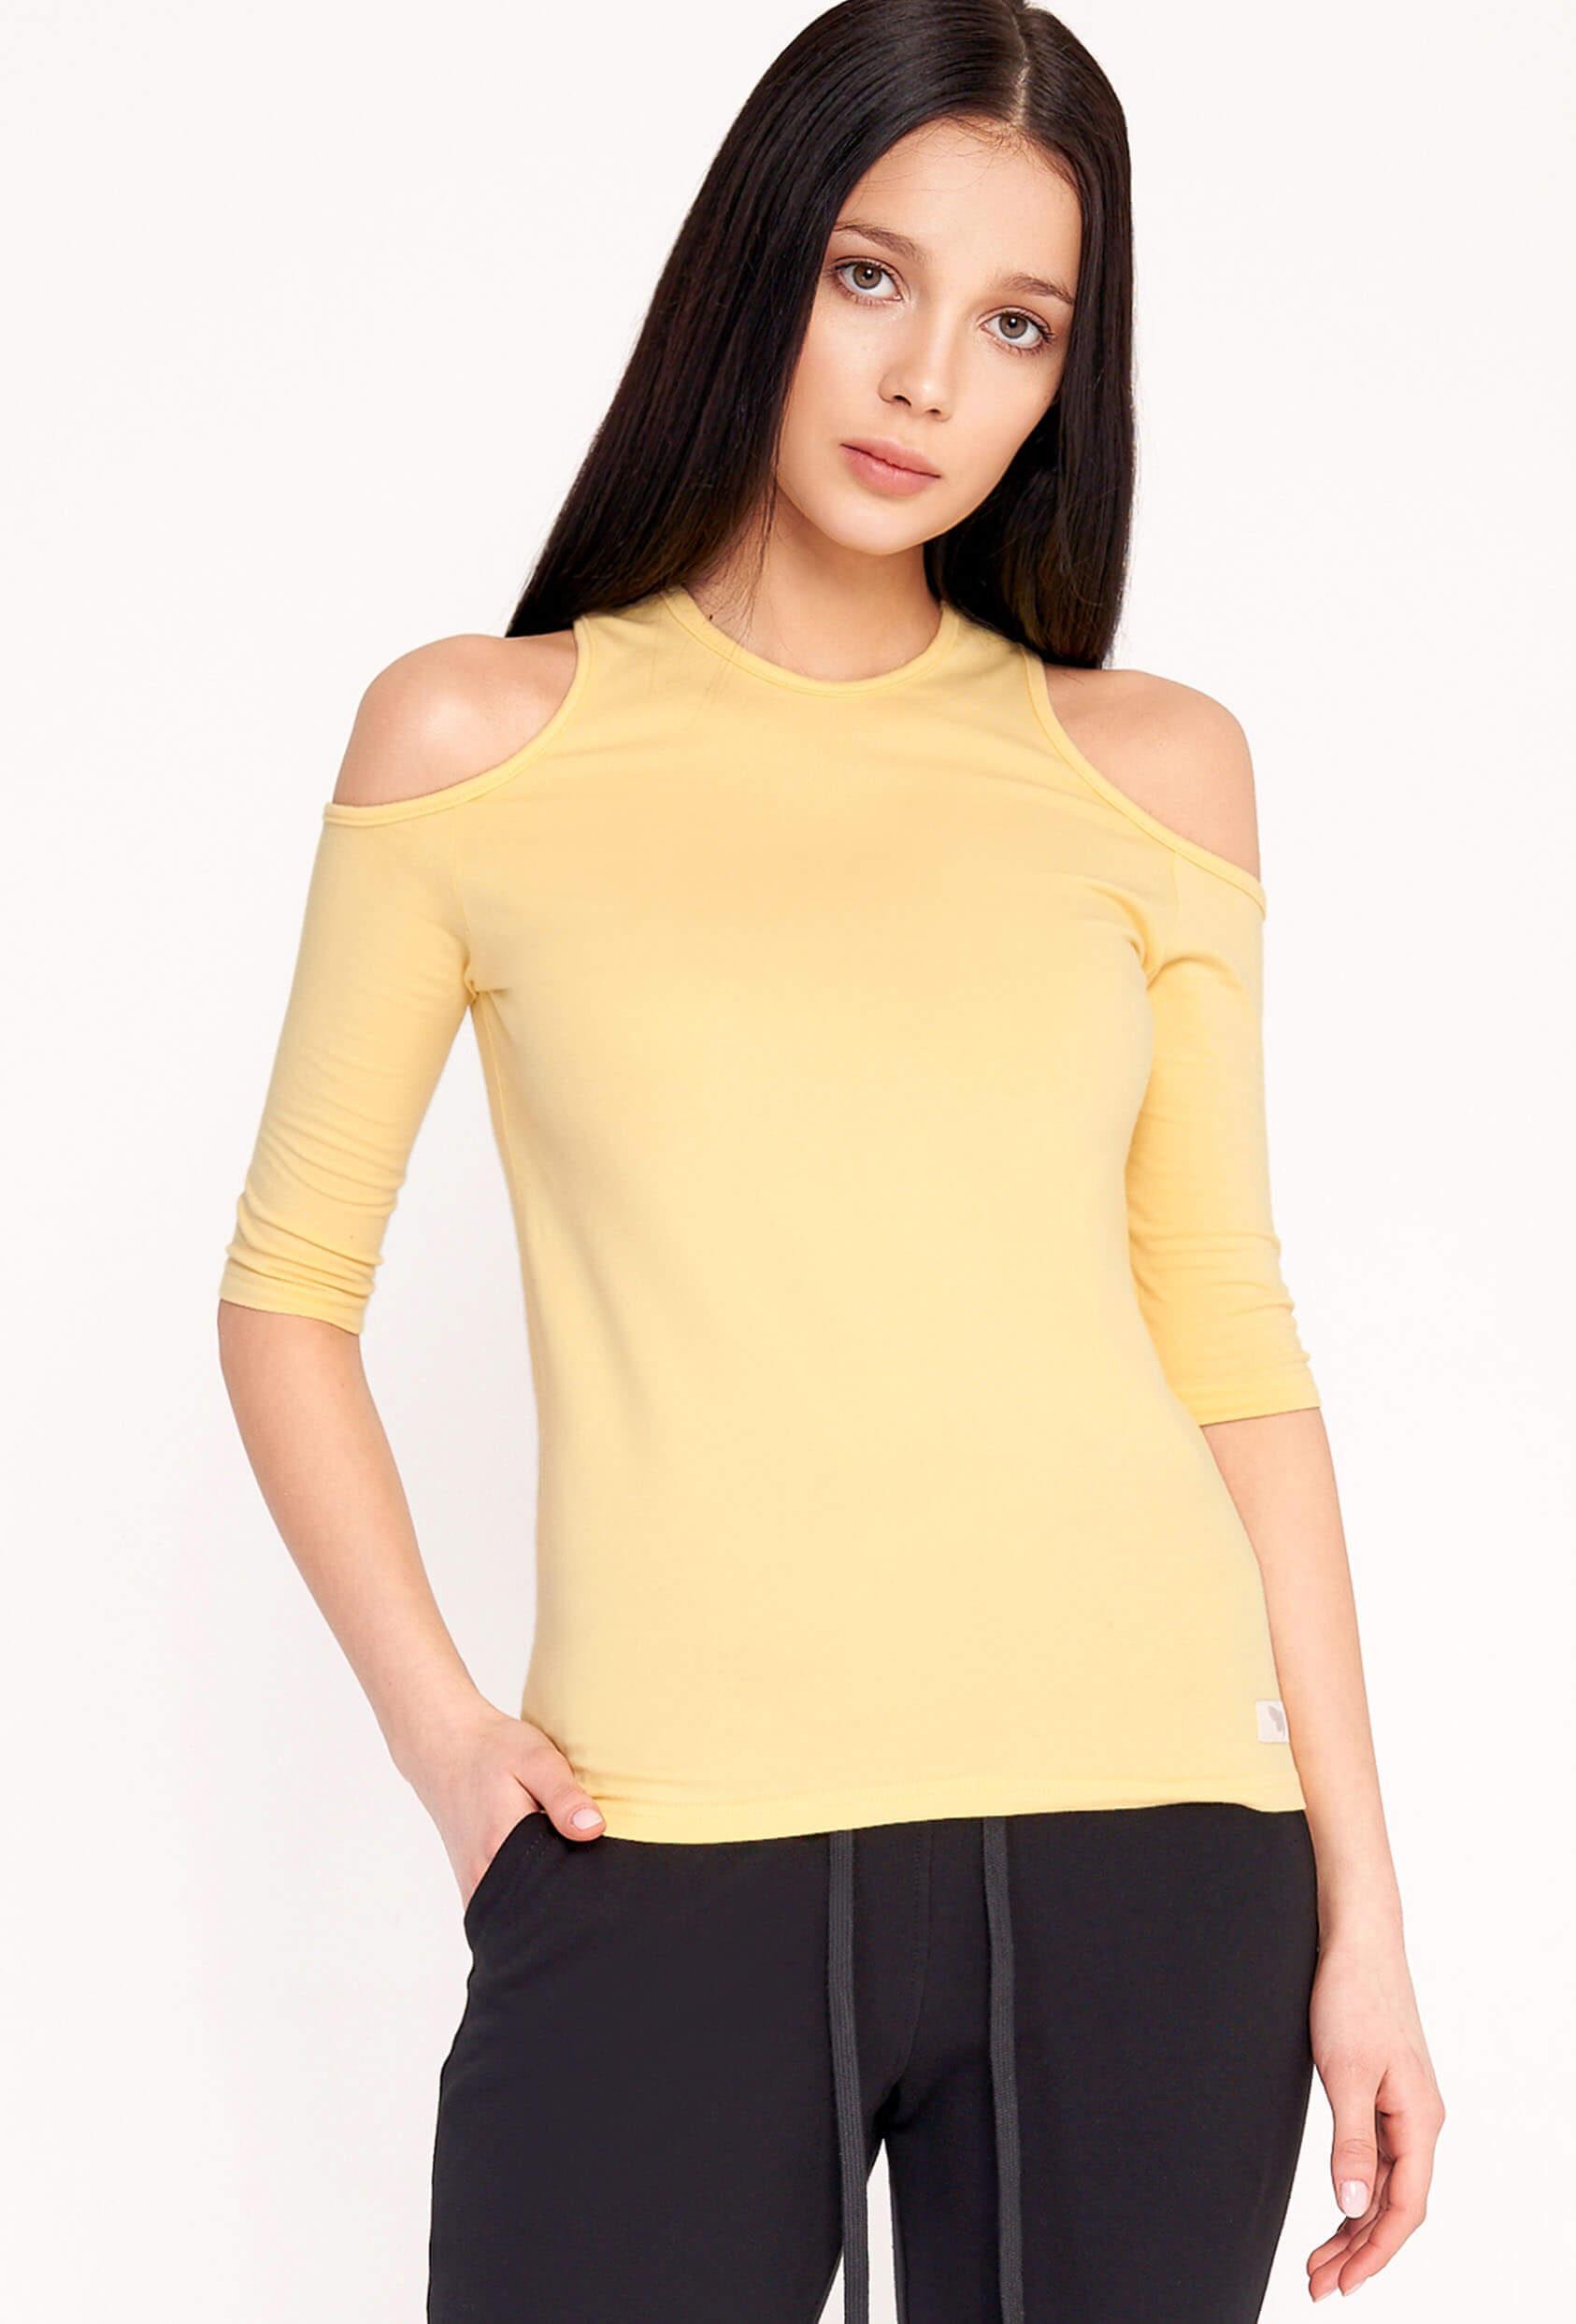 Bluzka dopasowana MIRANDA BLOUSE zółta